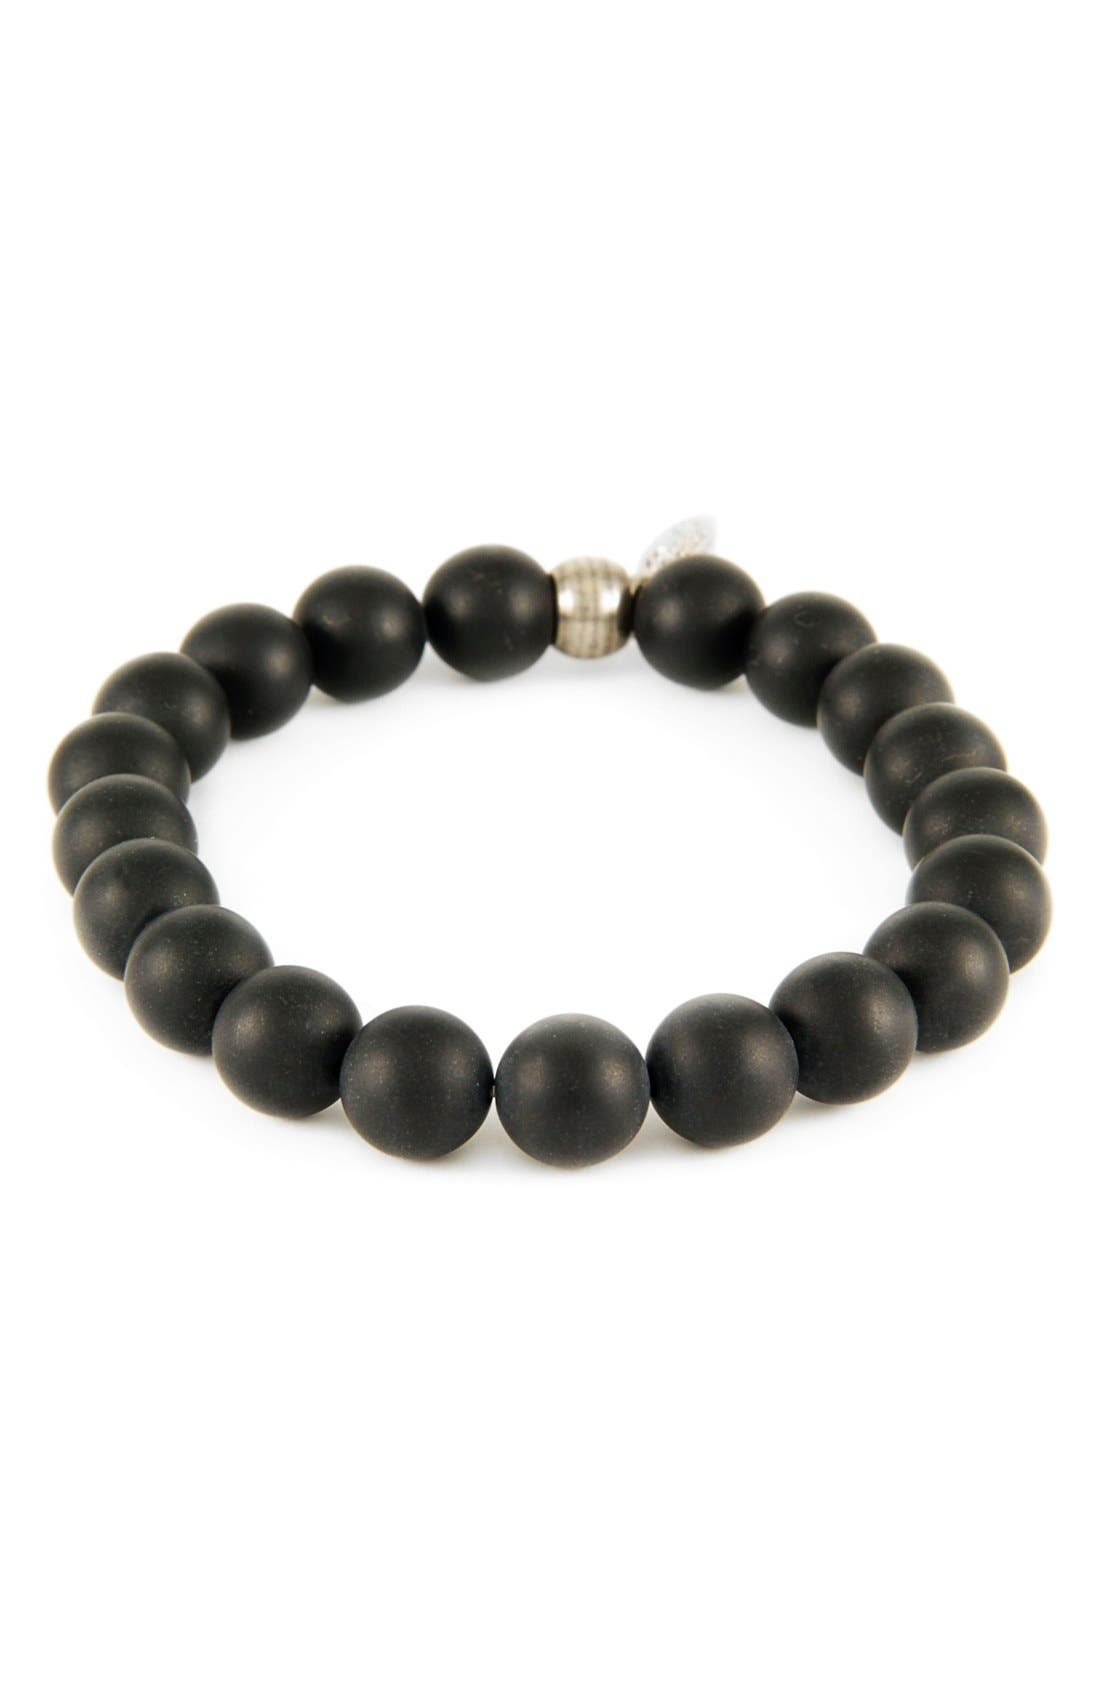 Onyx Stretch Bracelet,                             Main thumbnail 1, color,                             001